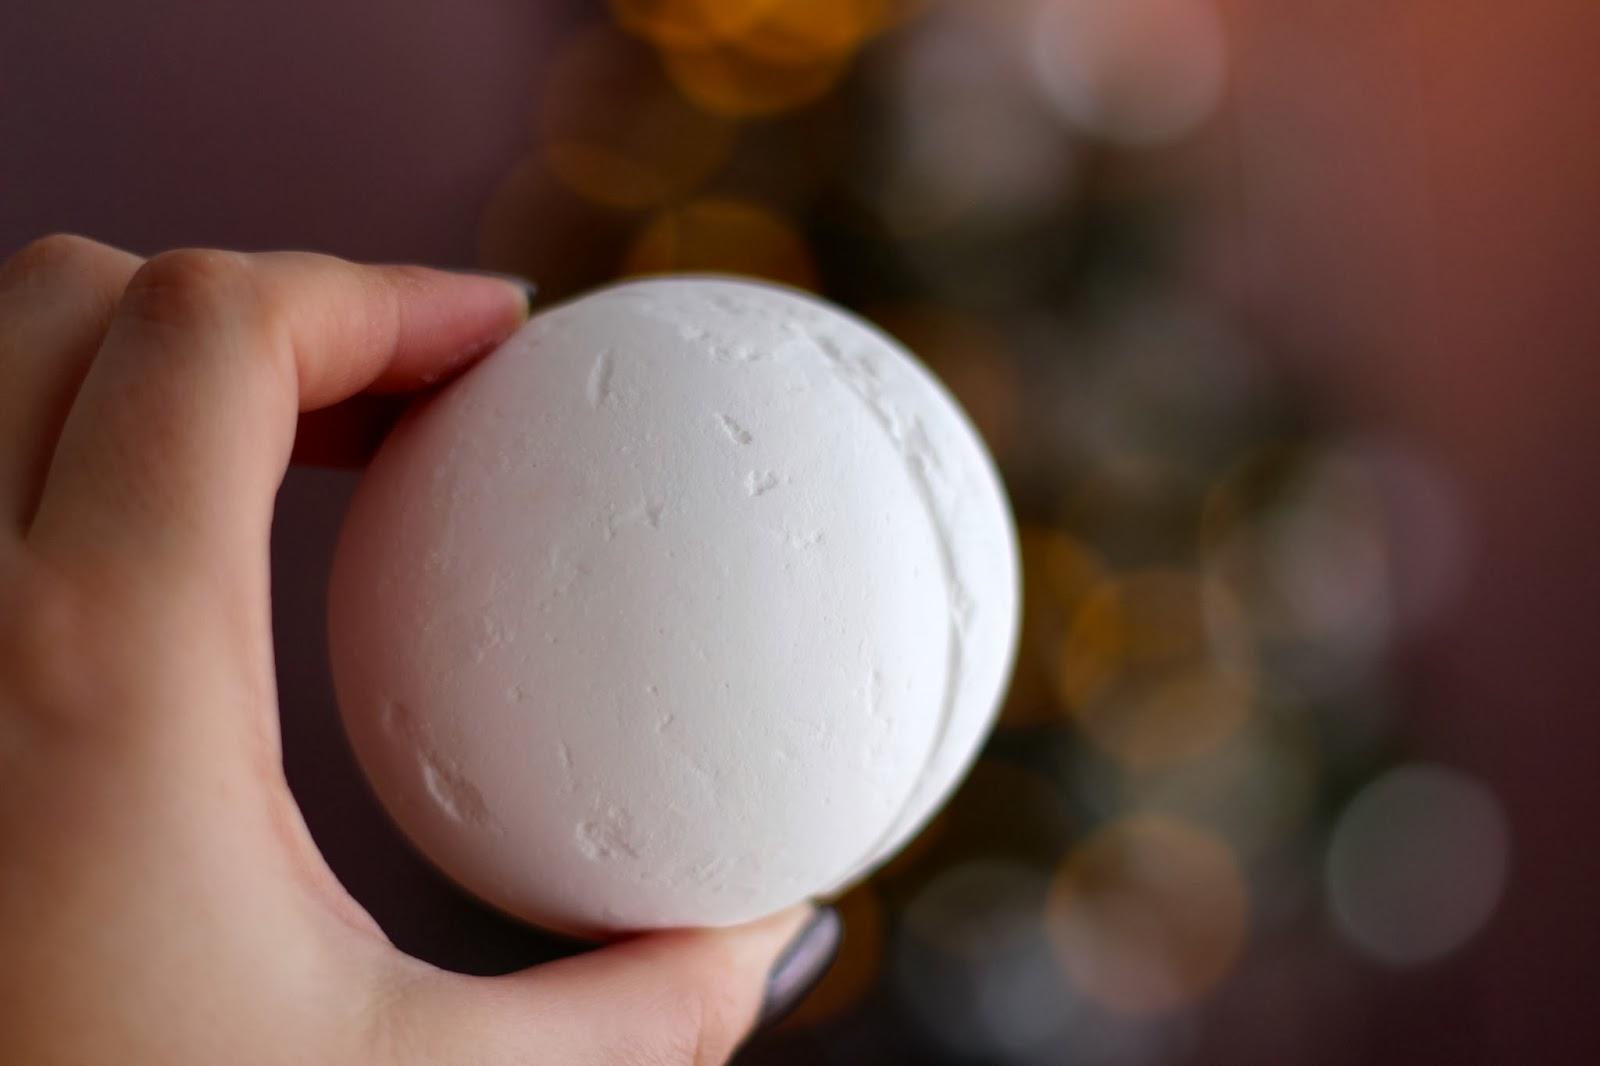 skincare-haul-lush-cosmetics-11